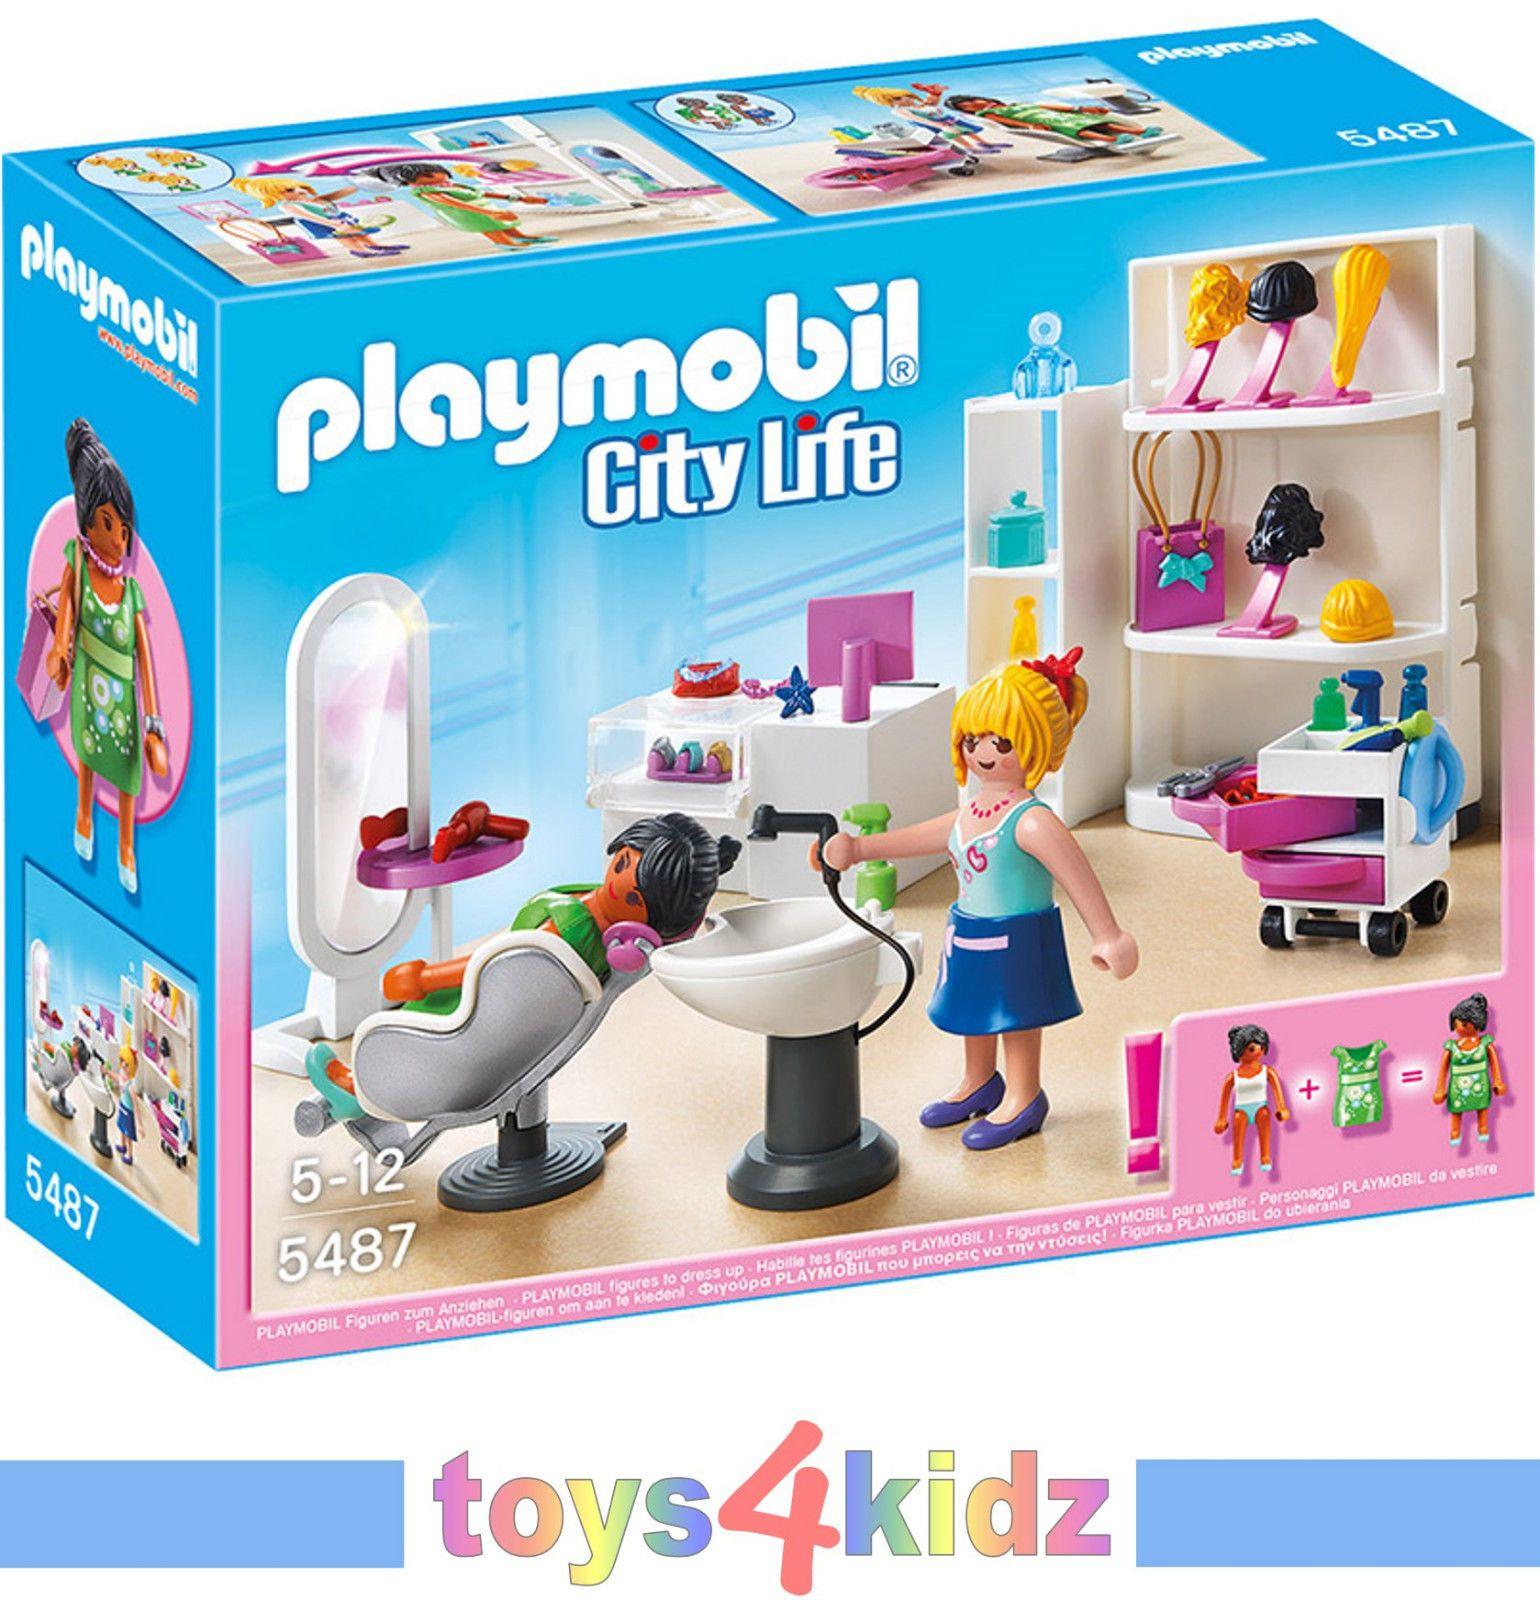 Ebay Angebot Playmobil City Life 5487 Beauty Salon Neu Ovp Ihr Quickberater Playmobil Play Mobile Spielzeug